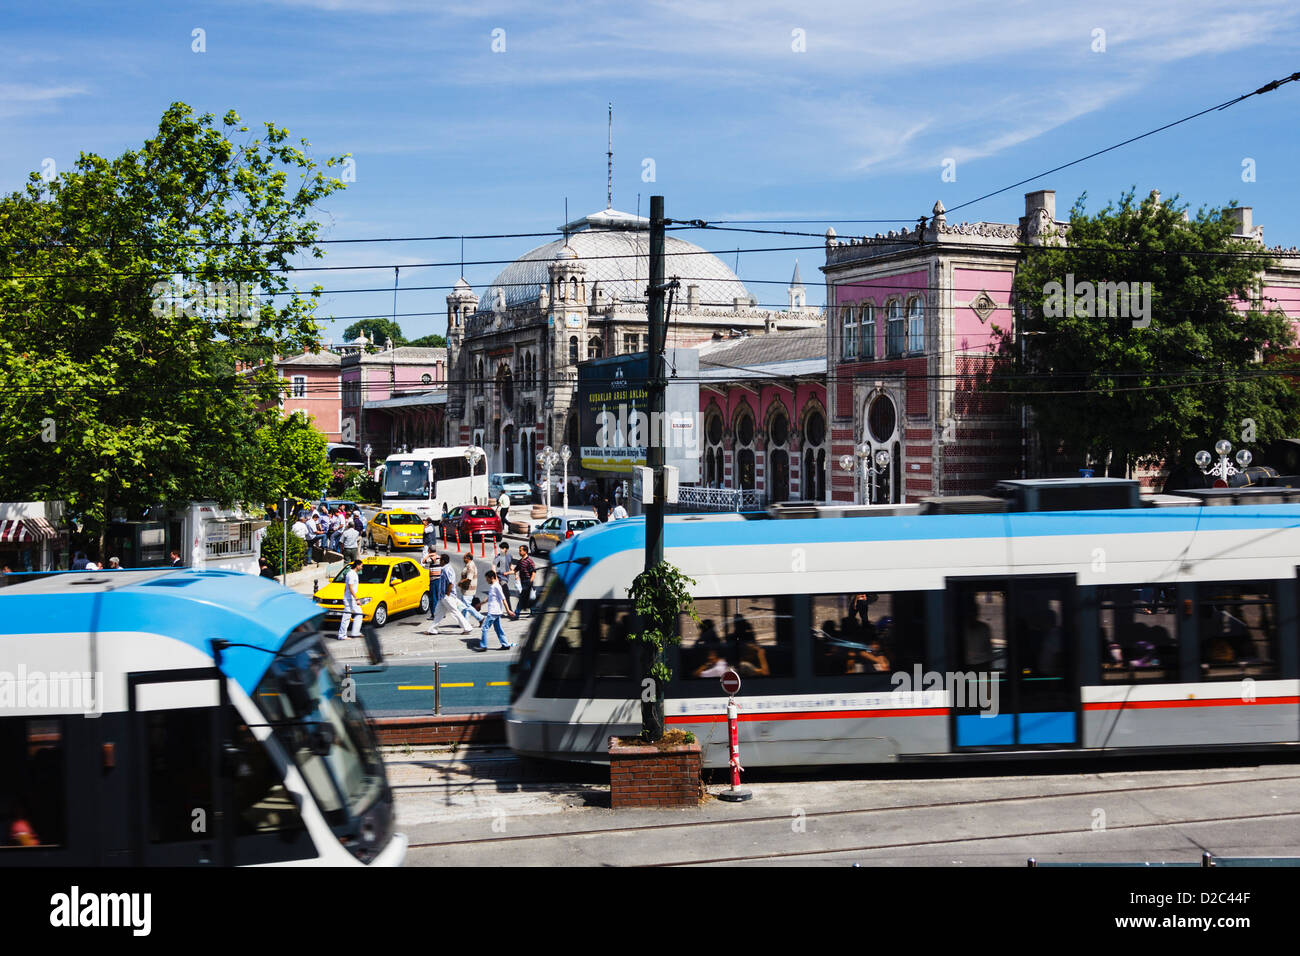 Streetcars next to Sirkeci Terminal. Istanbul, Turkey - Stock Image